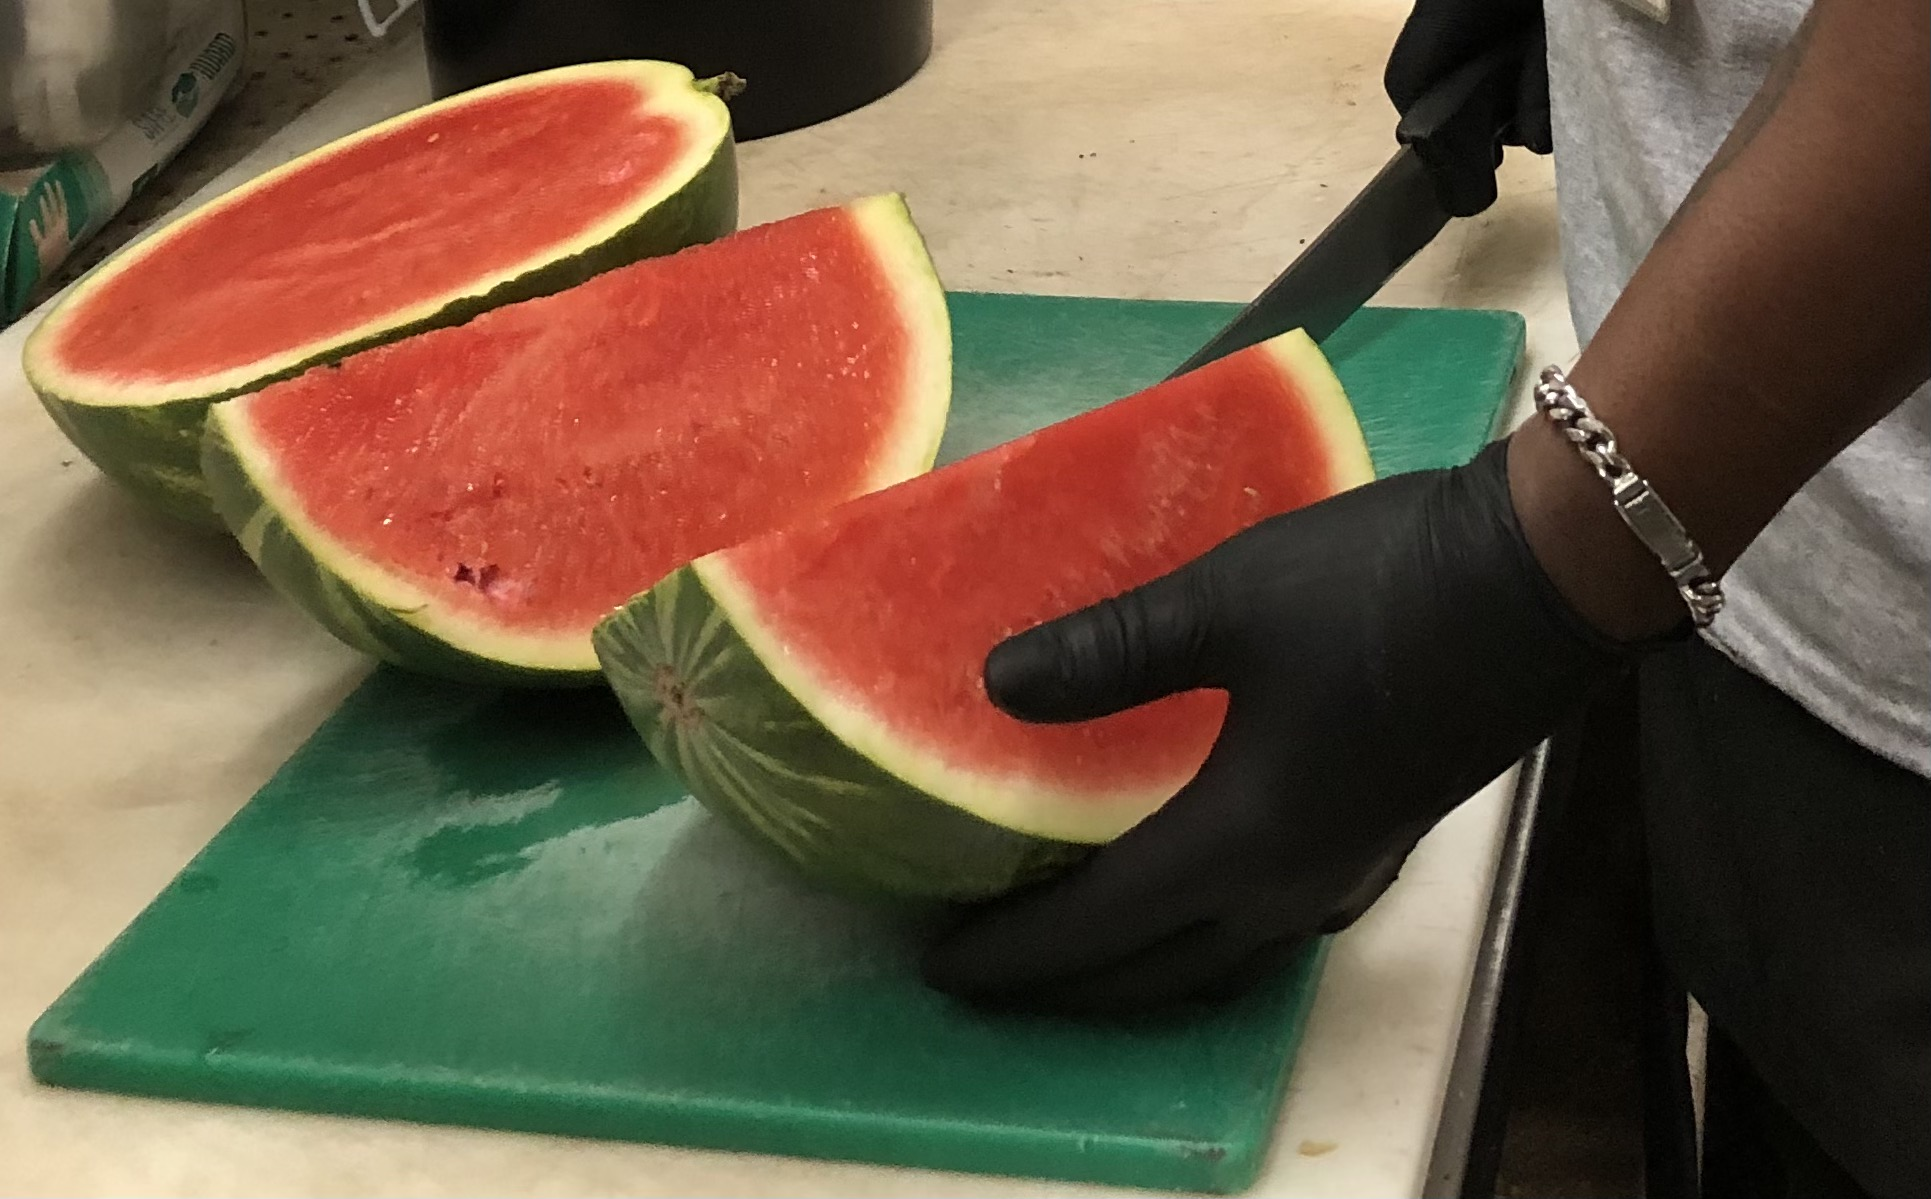 Photo: Teddy Slicing Watermelon.